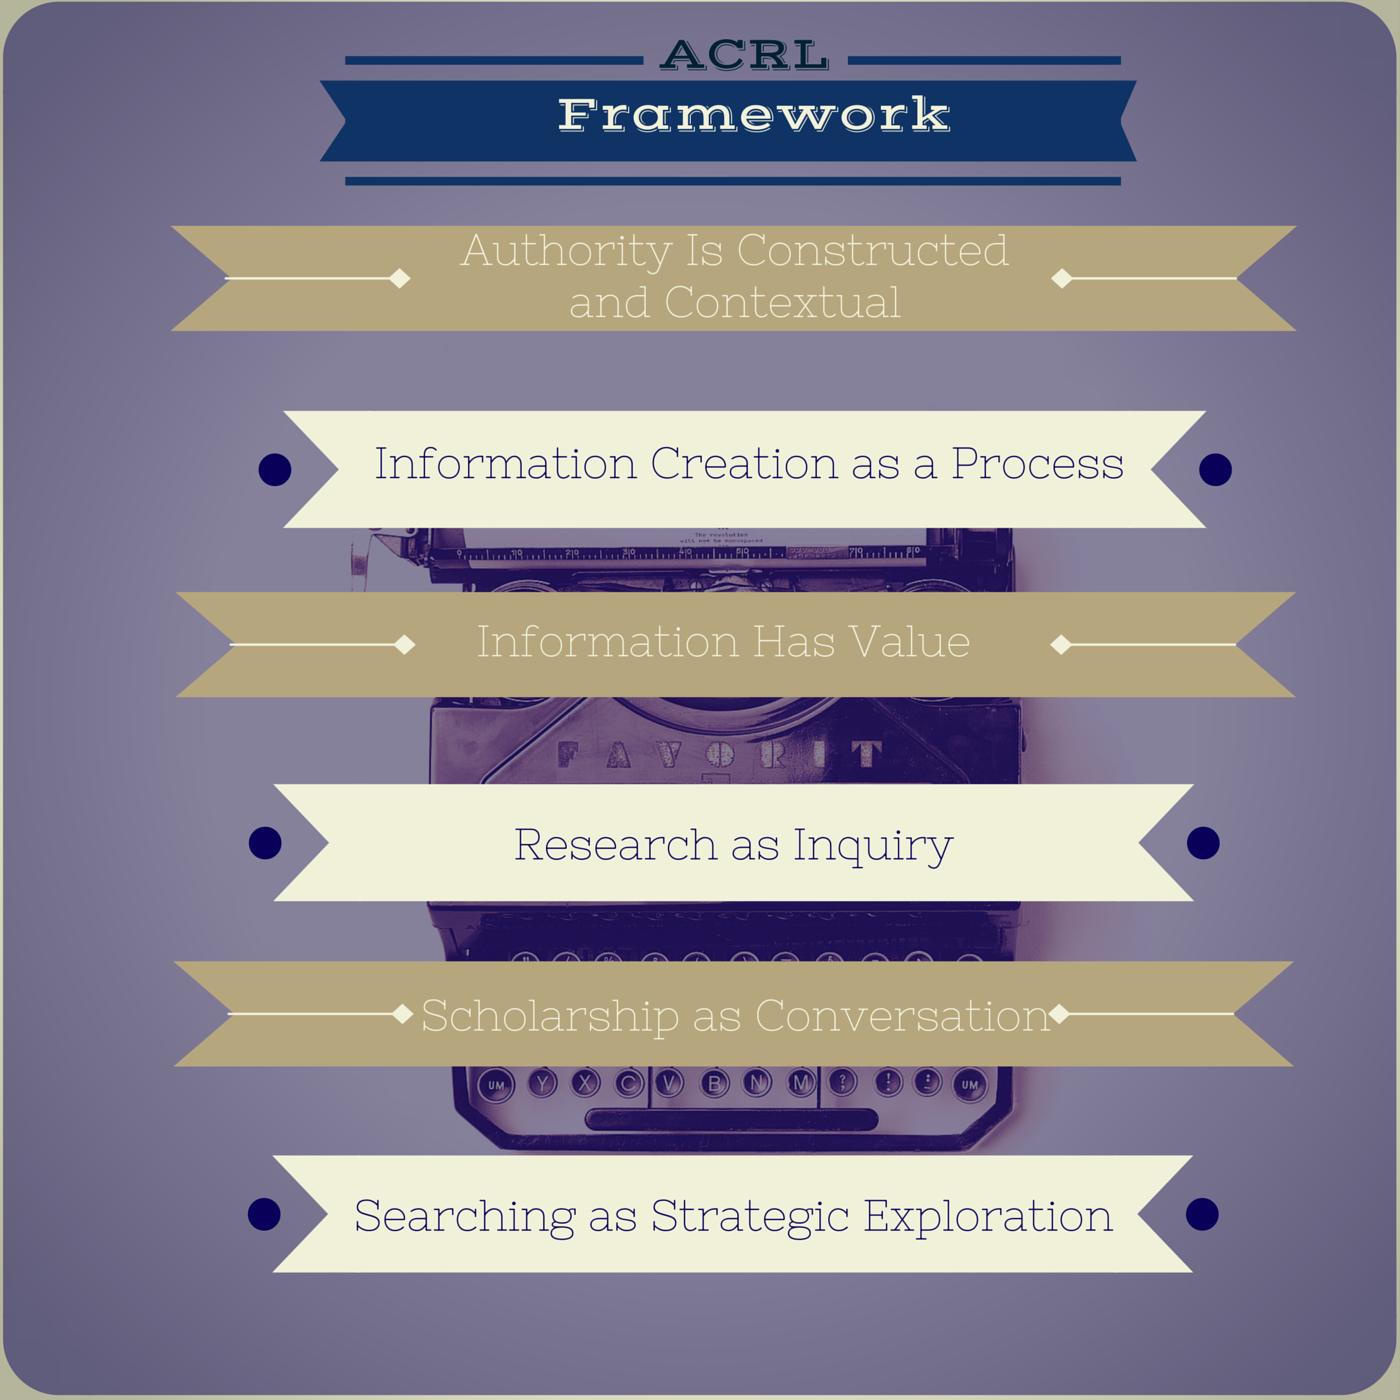 acrl framework.png